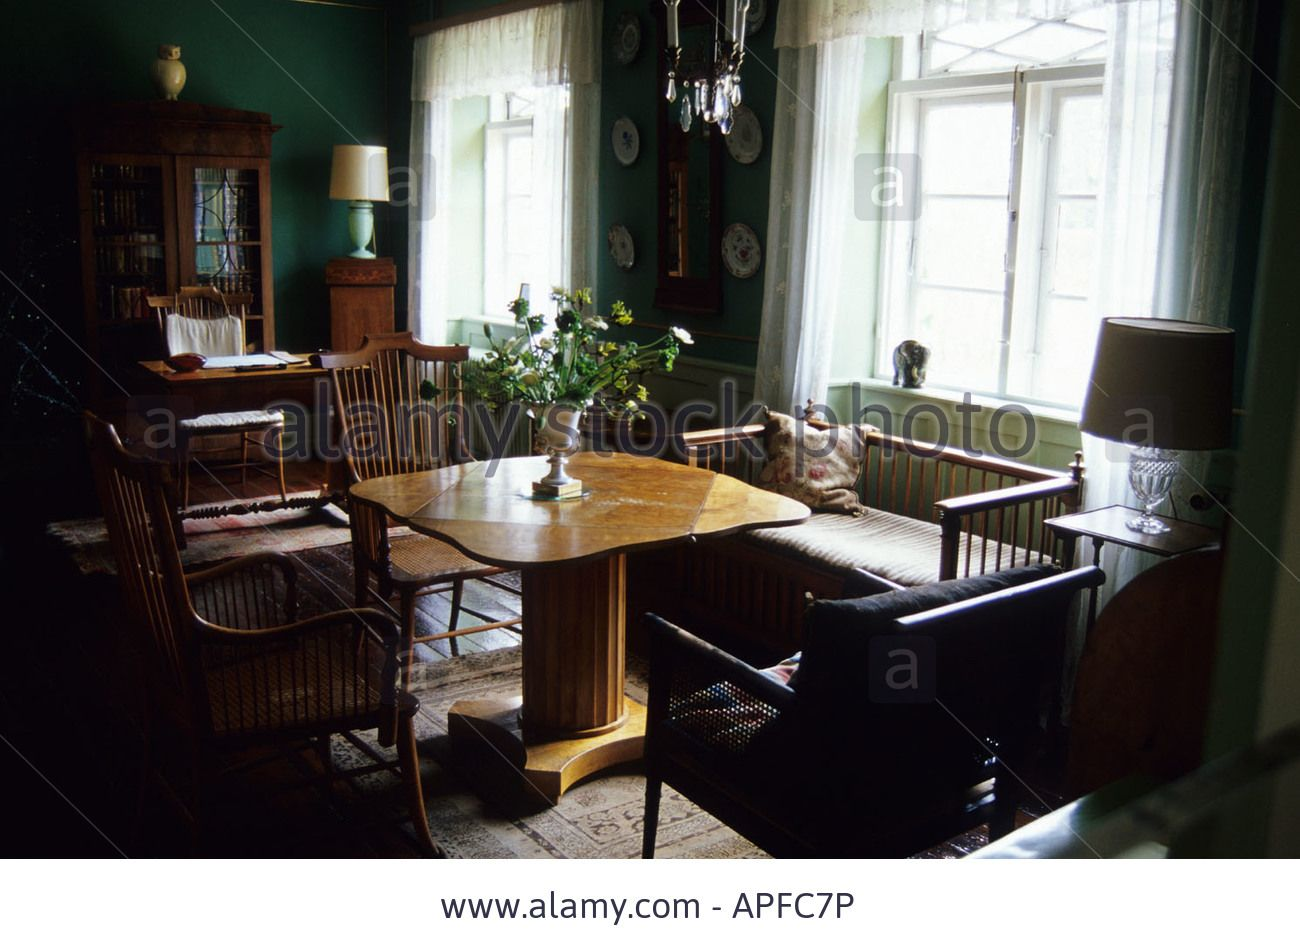 Karen Blixen House Museum in RUNGSTED Denmark Stock Photo